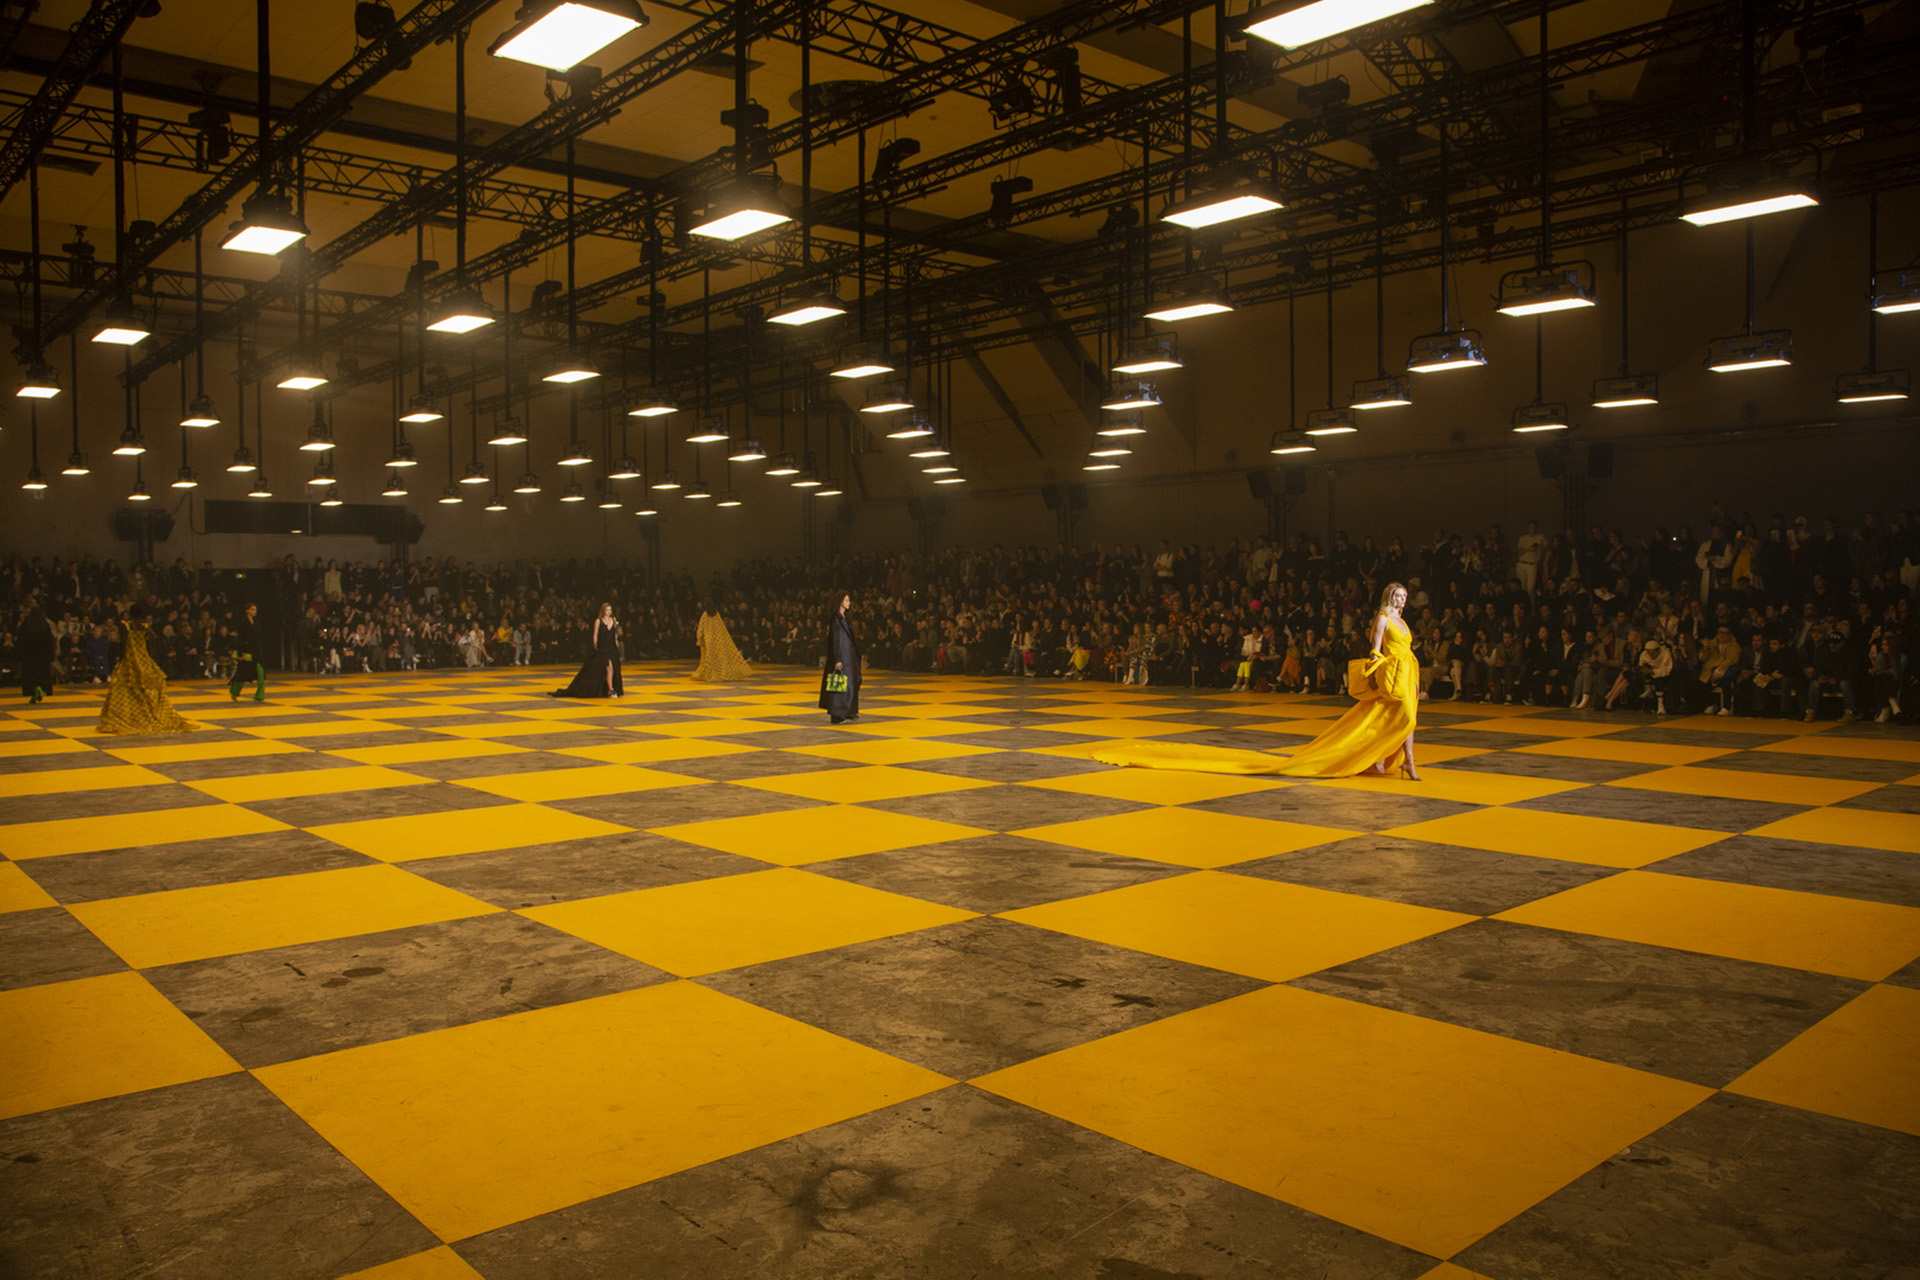 Thierry Dreyfus谈大型时装秀幕后的灯光与舞台设计